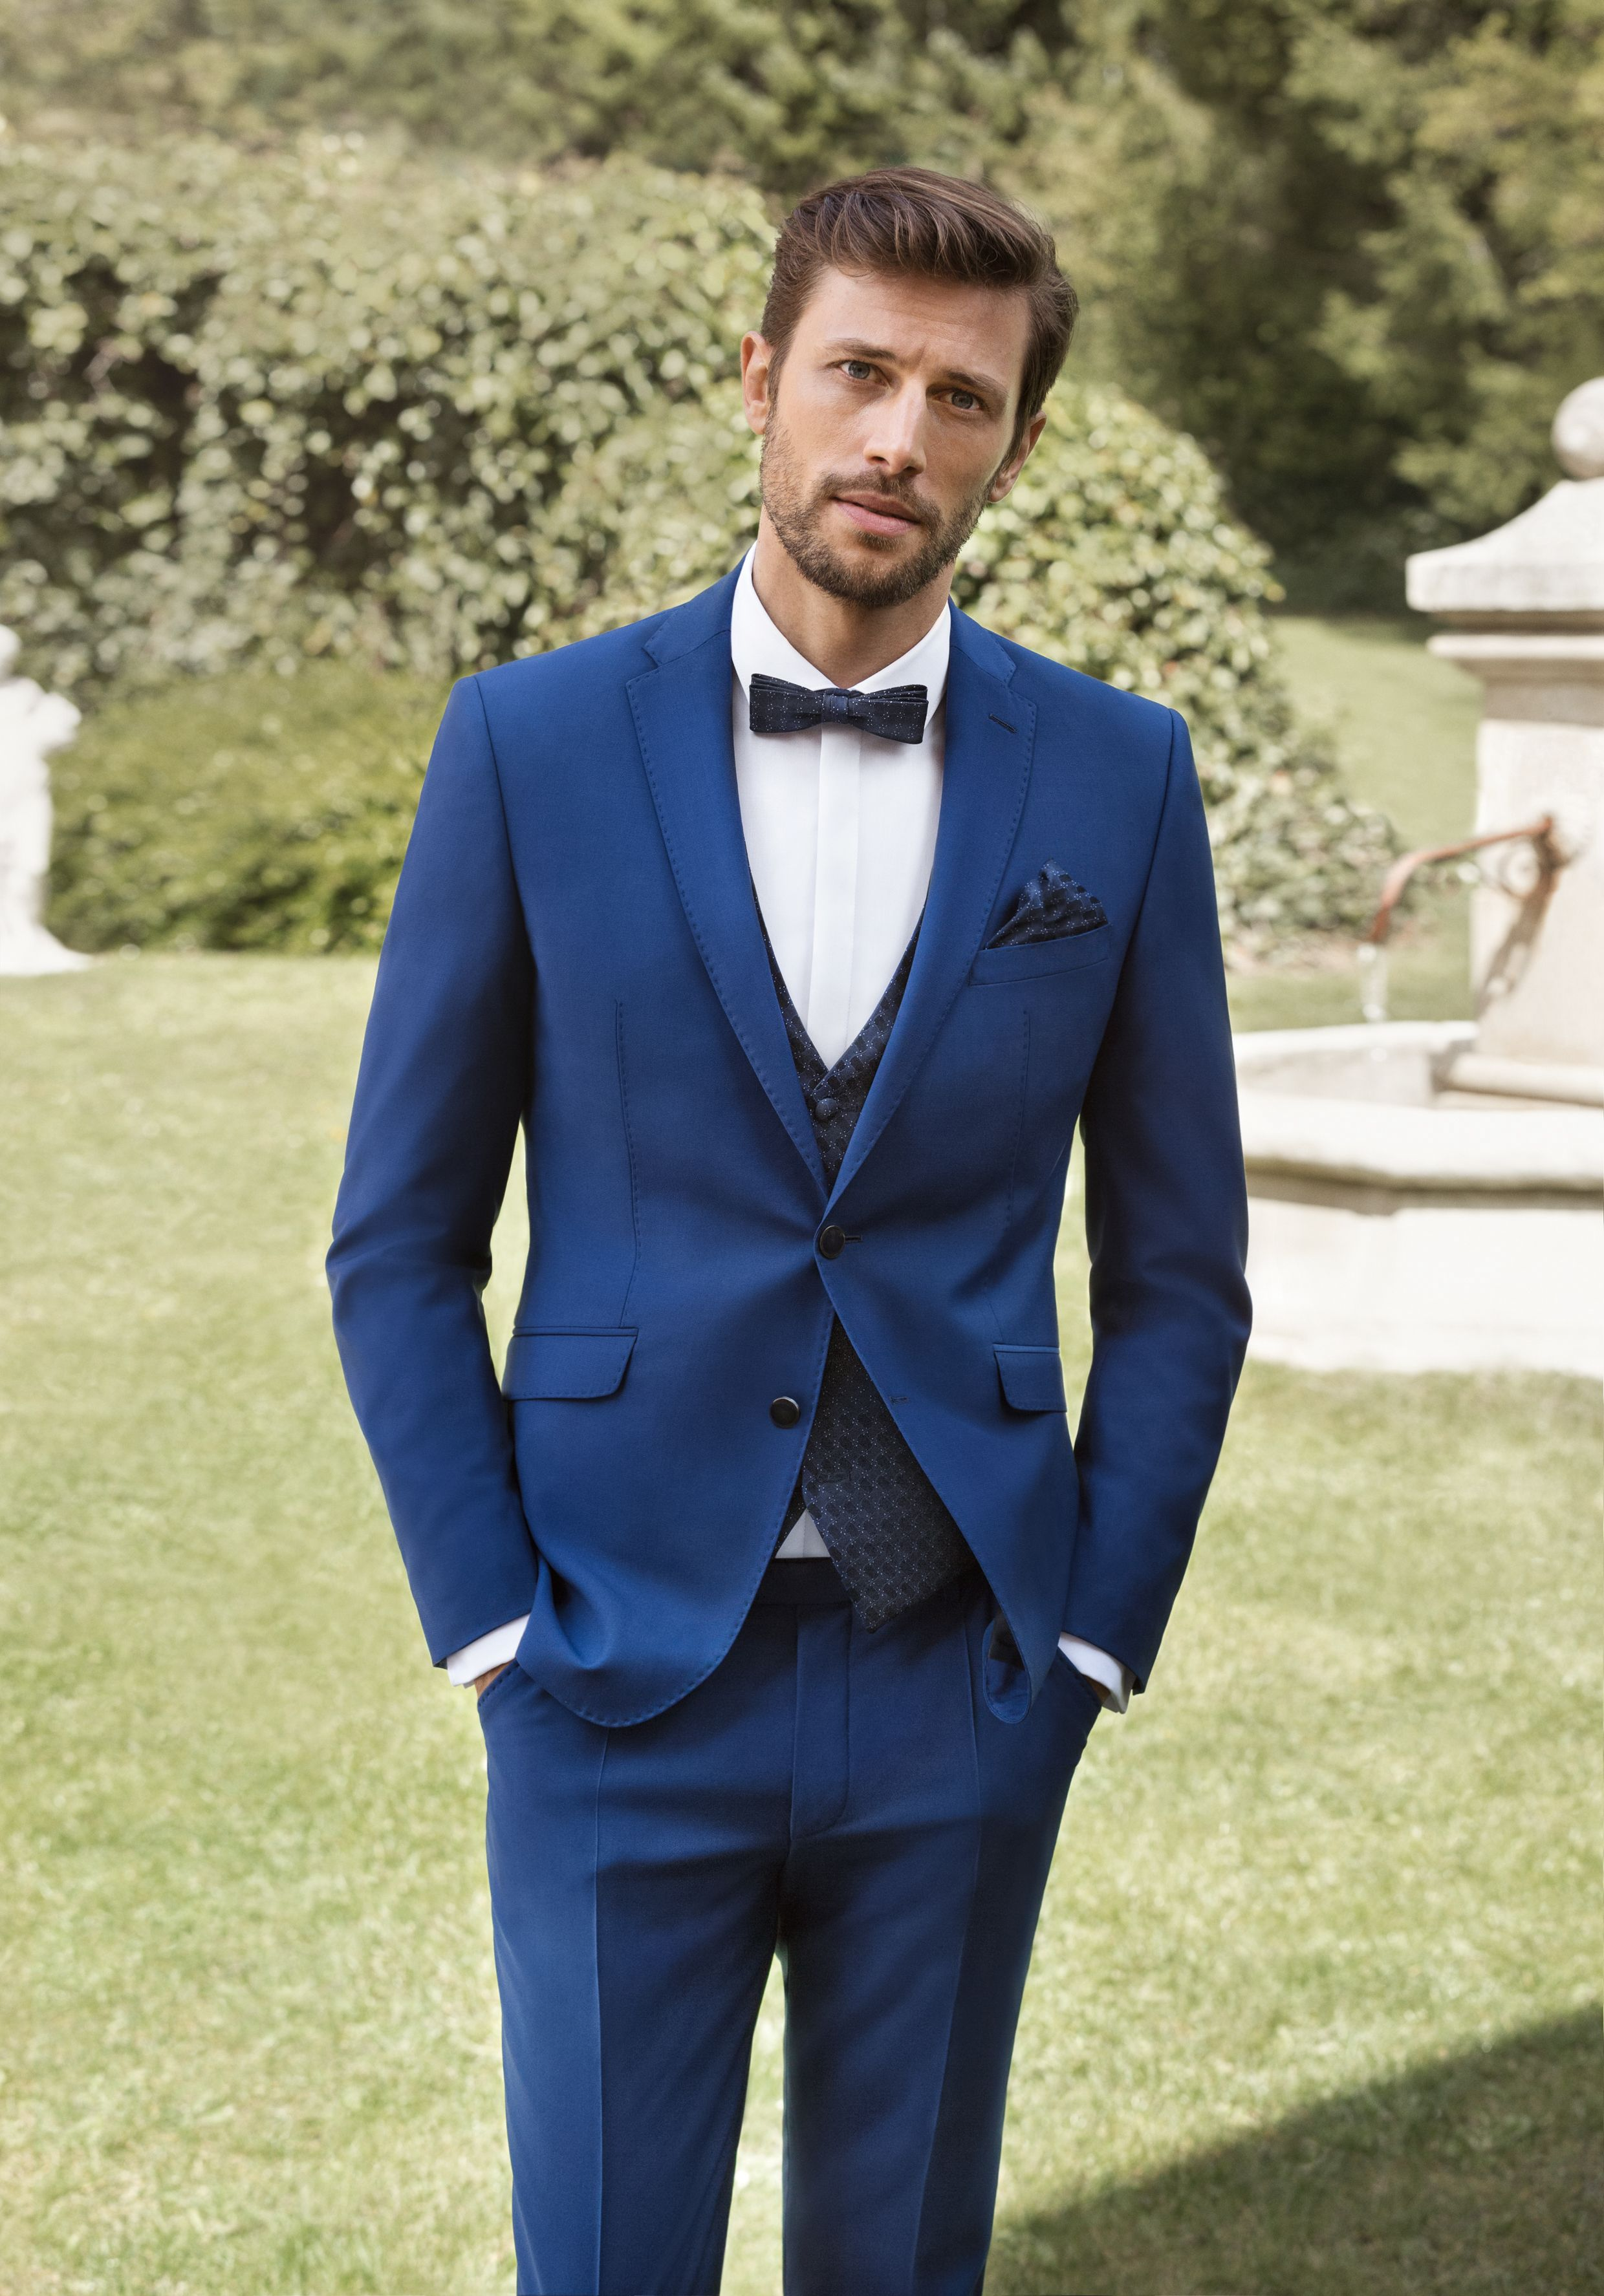 2019的blau Schwarzer Hochzeitsanzug Im Slim Fit Schnitt Aus Der